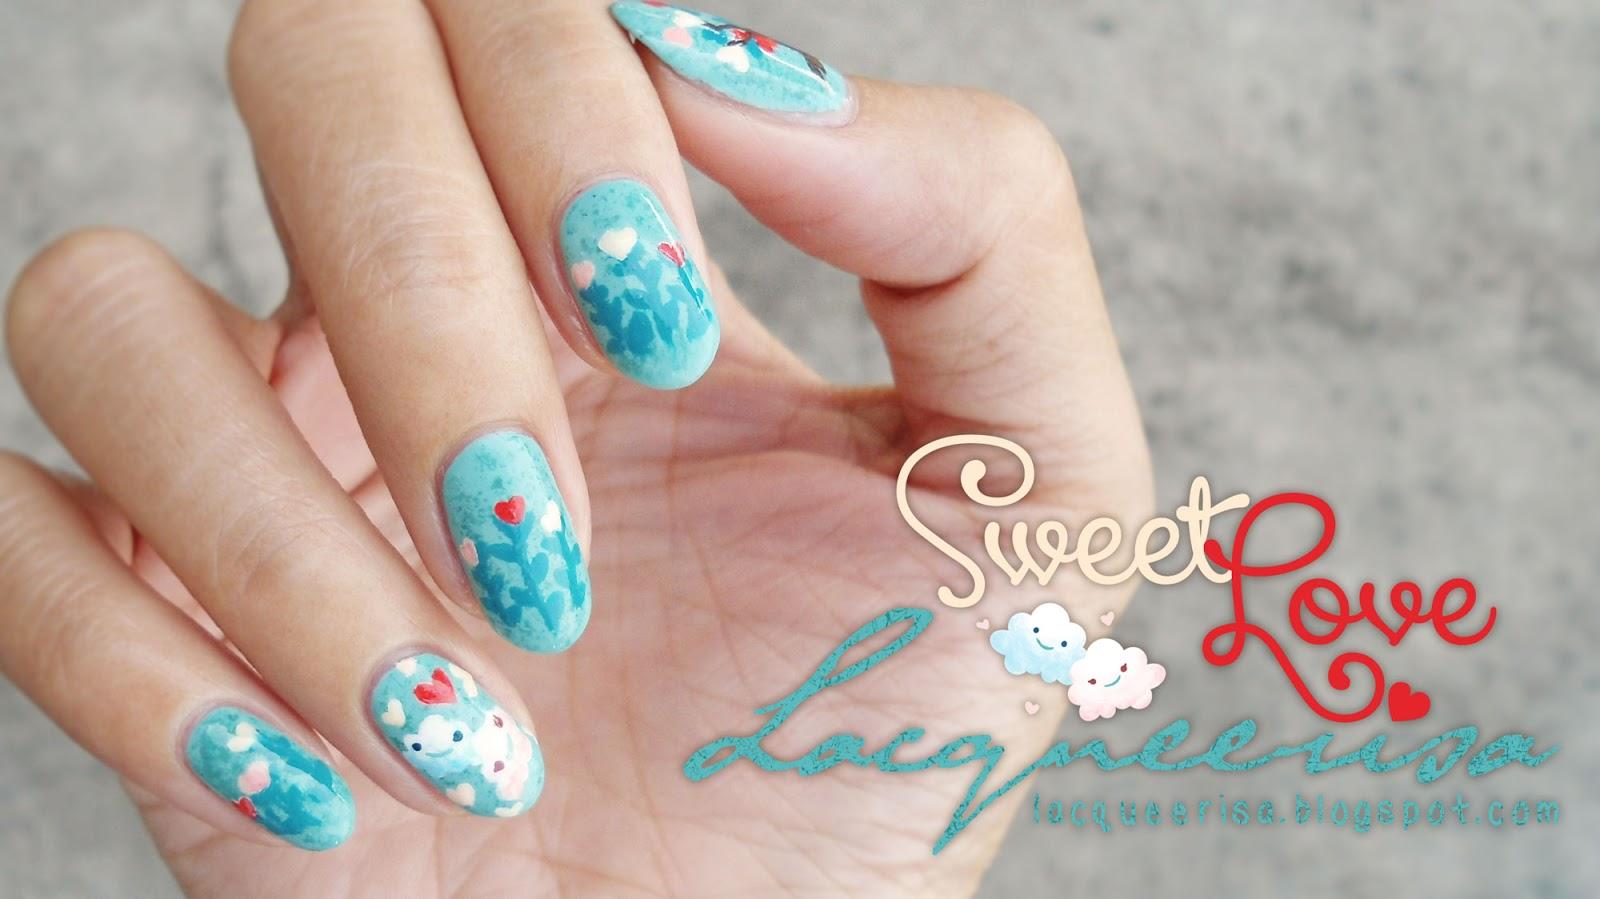 Lacqueerisa: Sweet Love